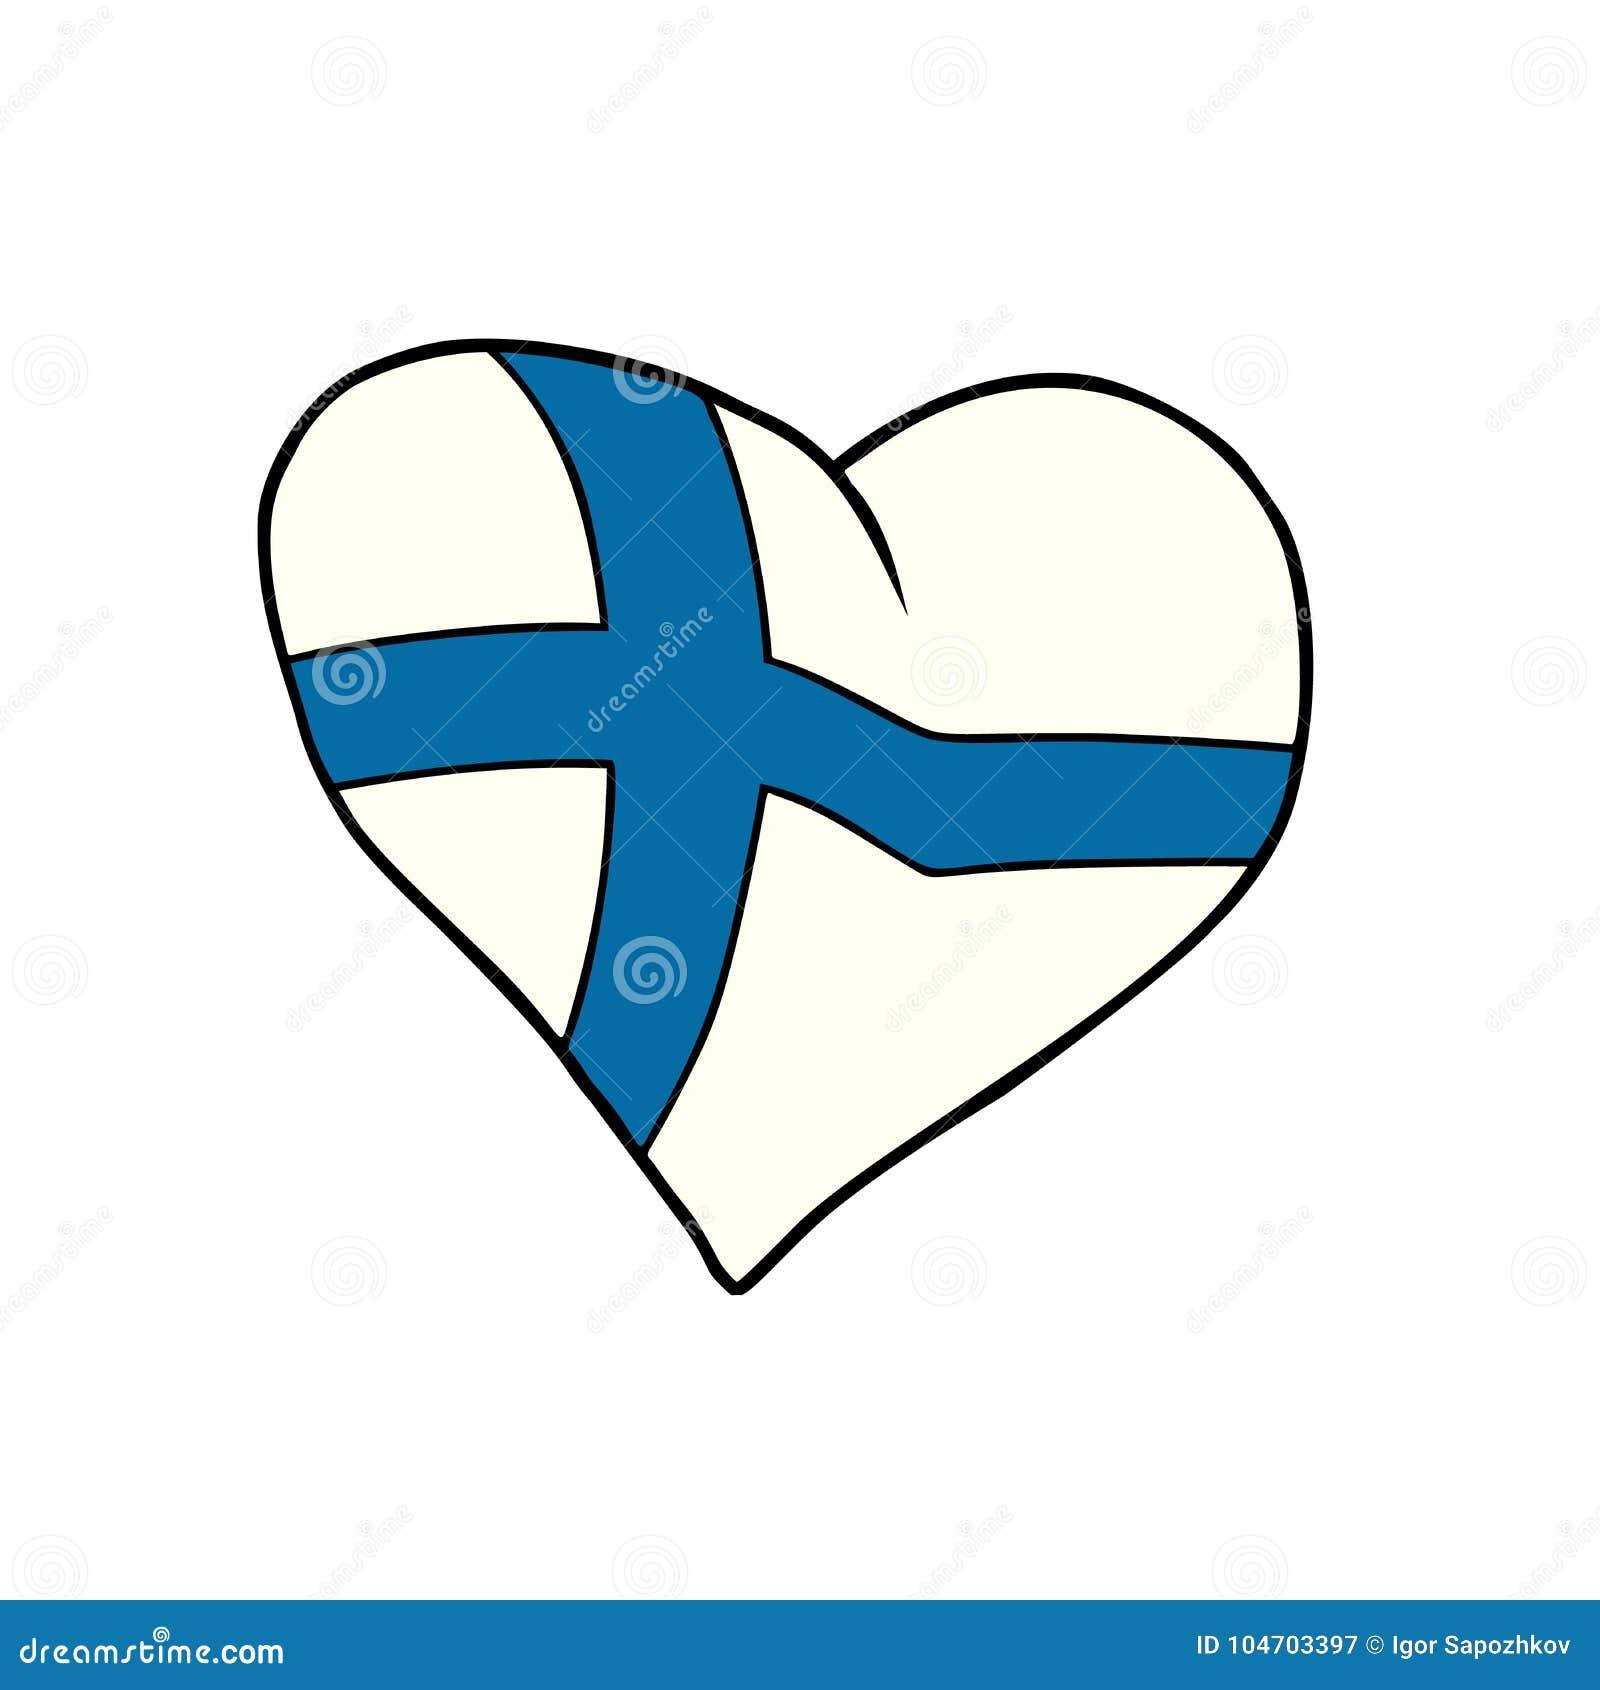 Finland Heart Patriotic Symbol Stock Vector Illustration Of Glory